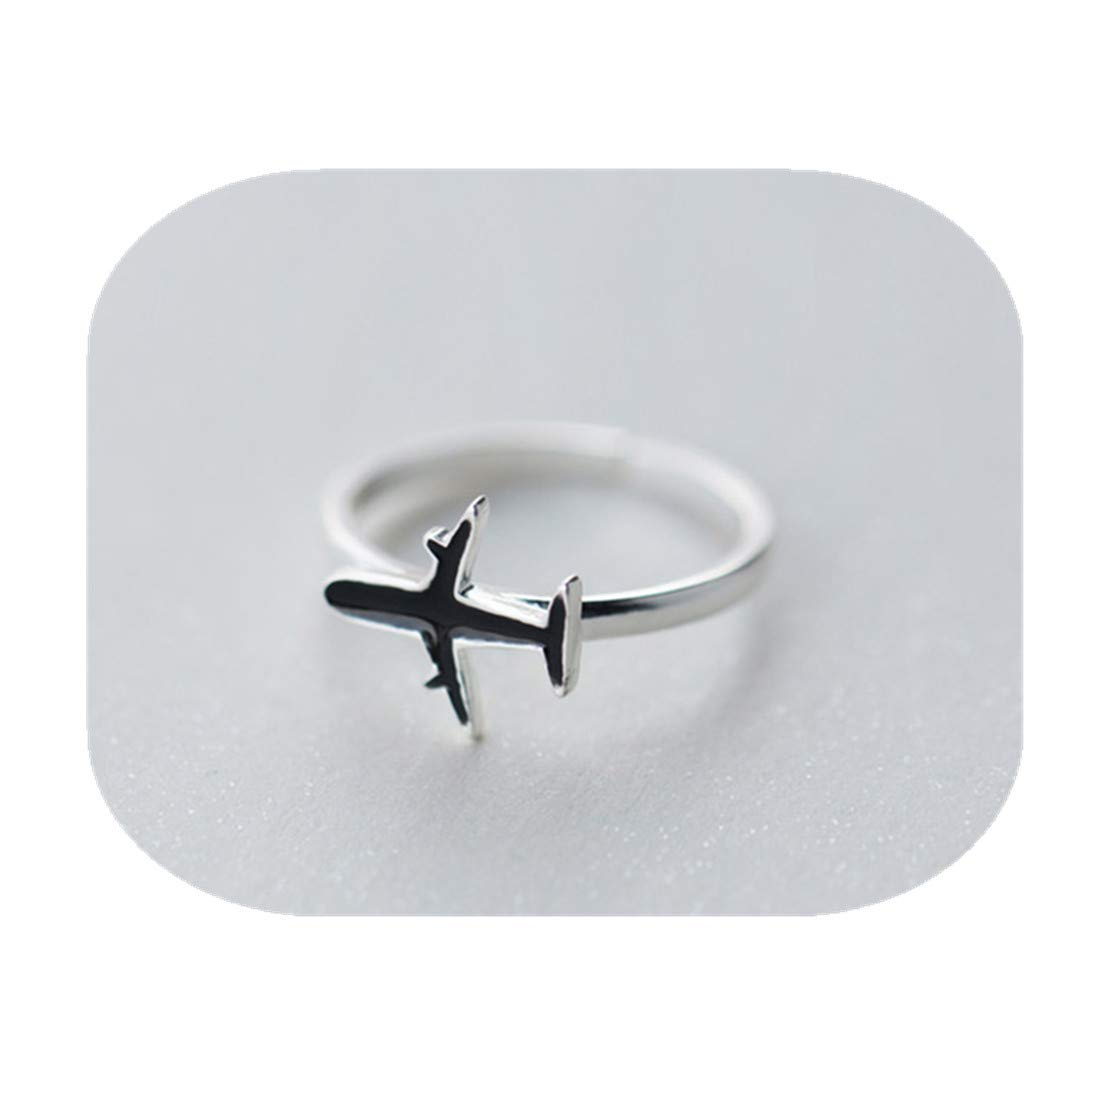 kakupao Plane Airplane Aeroplane Travel Ring, Travel Traveller Journey Gift World Aviation